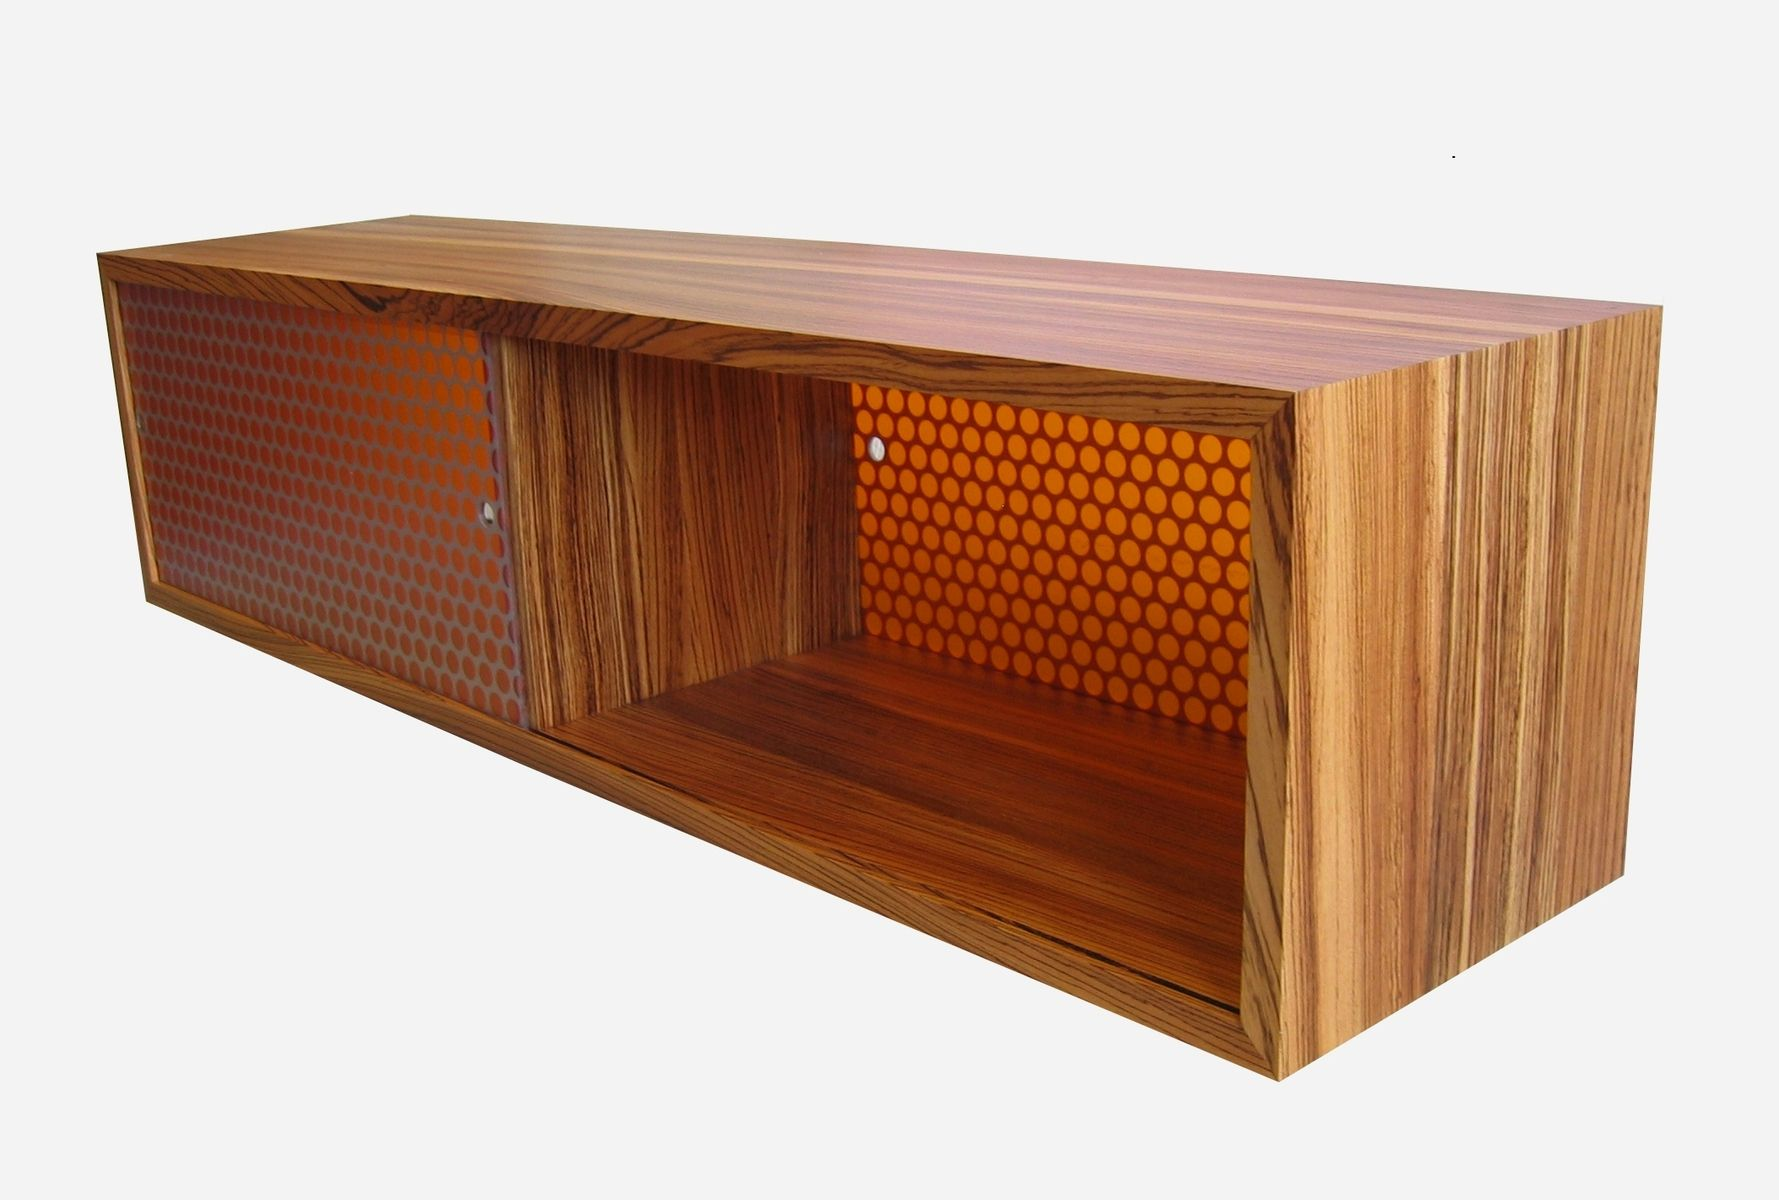 Custom Made Zebrawood Storage Bench